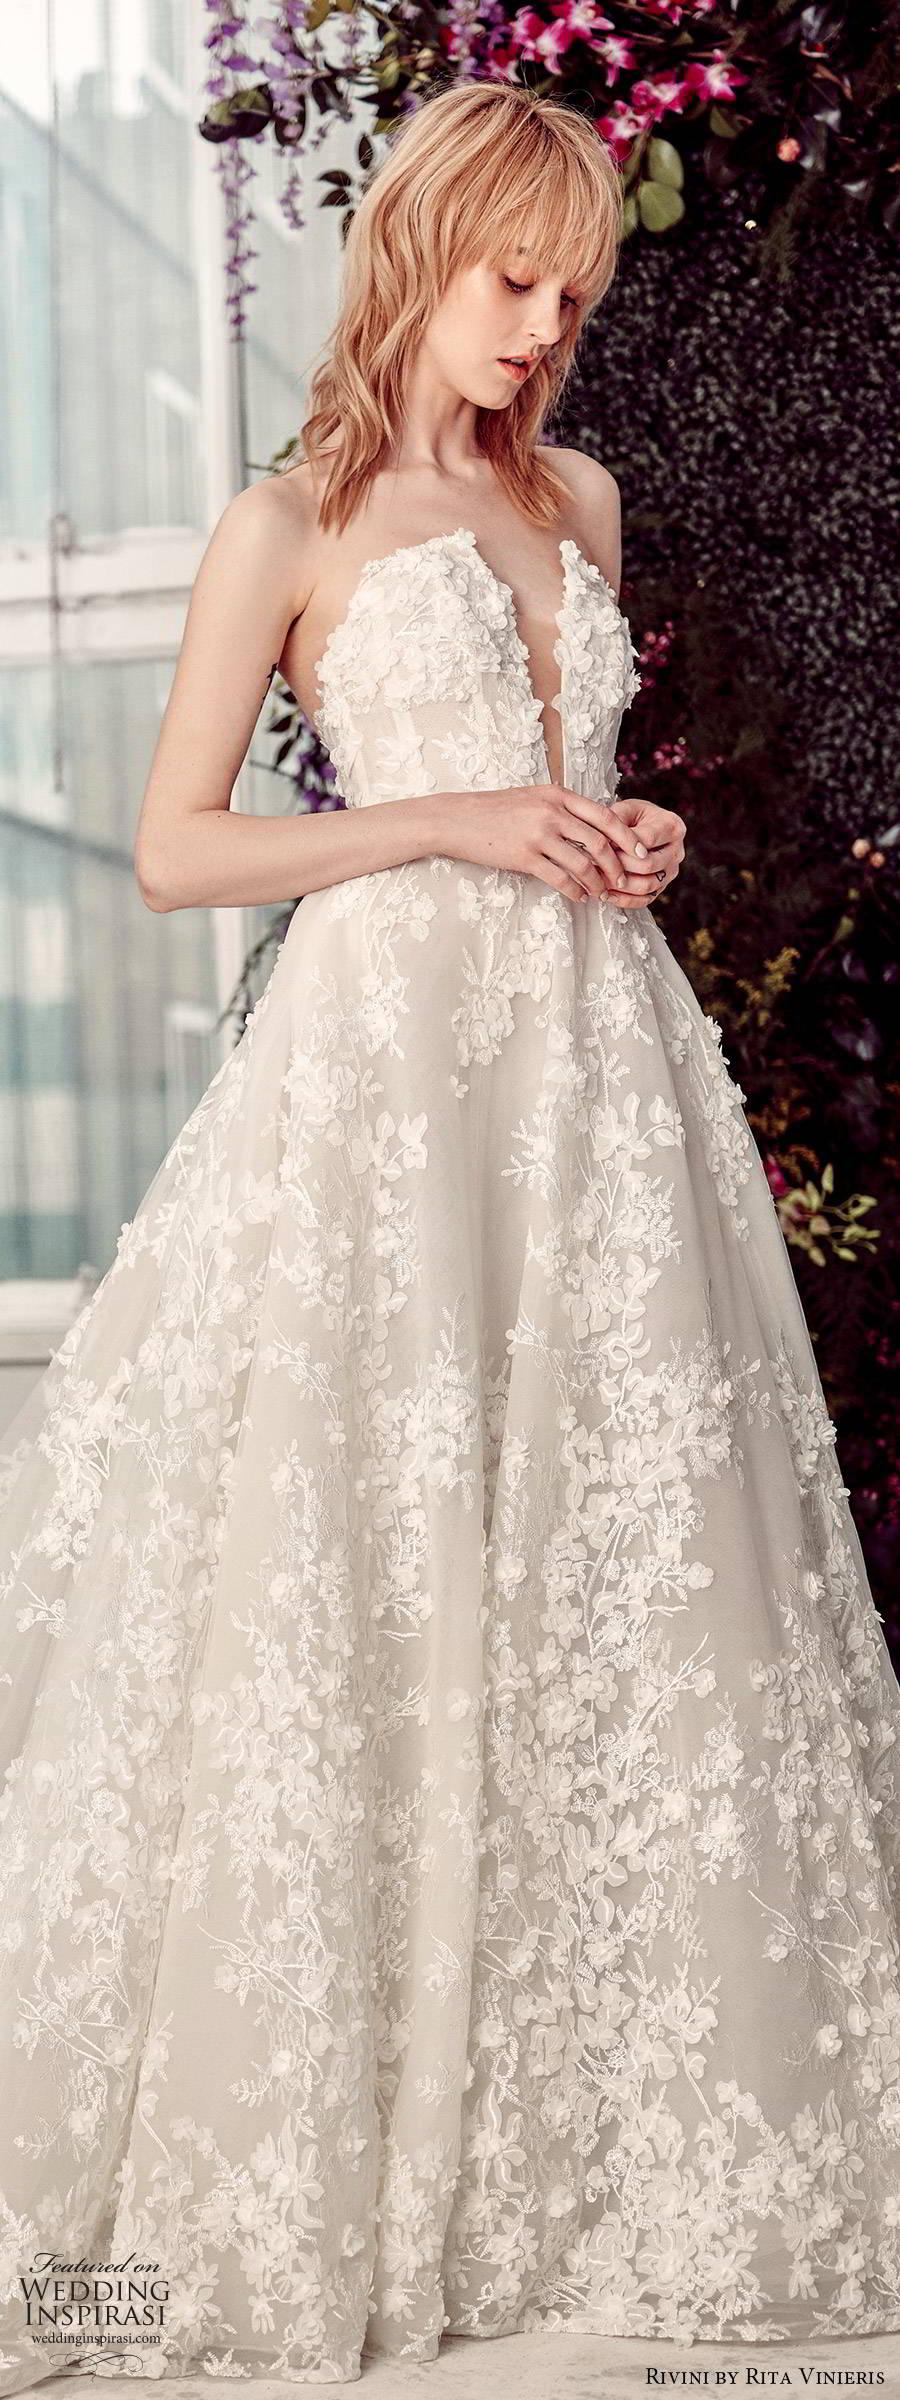 rivini by rita vinieris spring 2020 bridal strapless plunging v neckline fully embellished lace elegant romantic a line ball gown wedding dress chapel train (2) lv